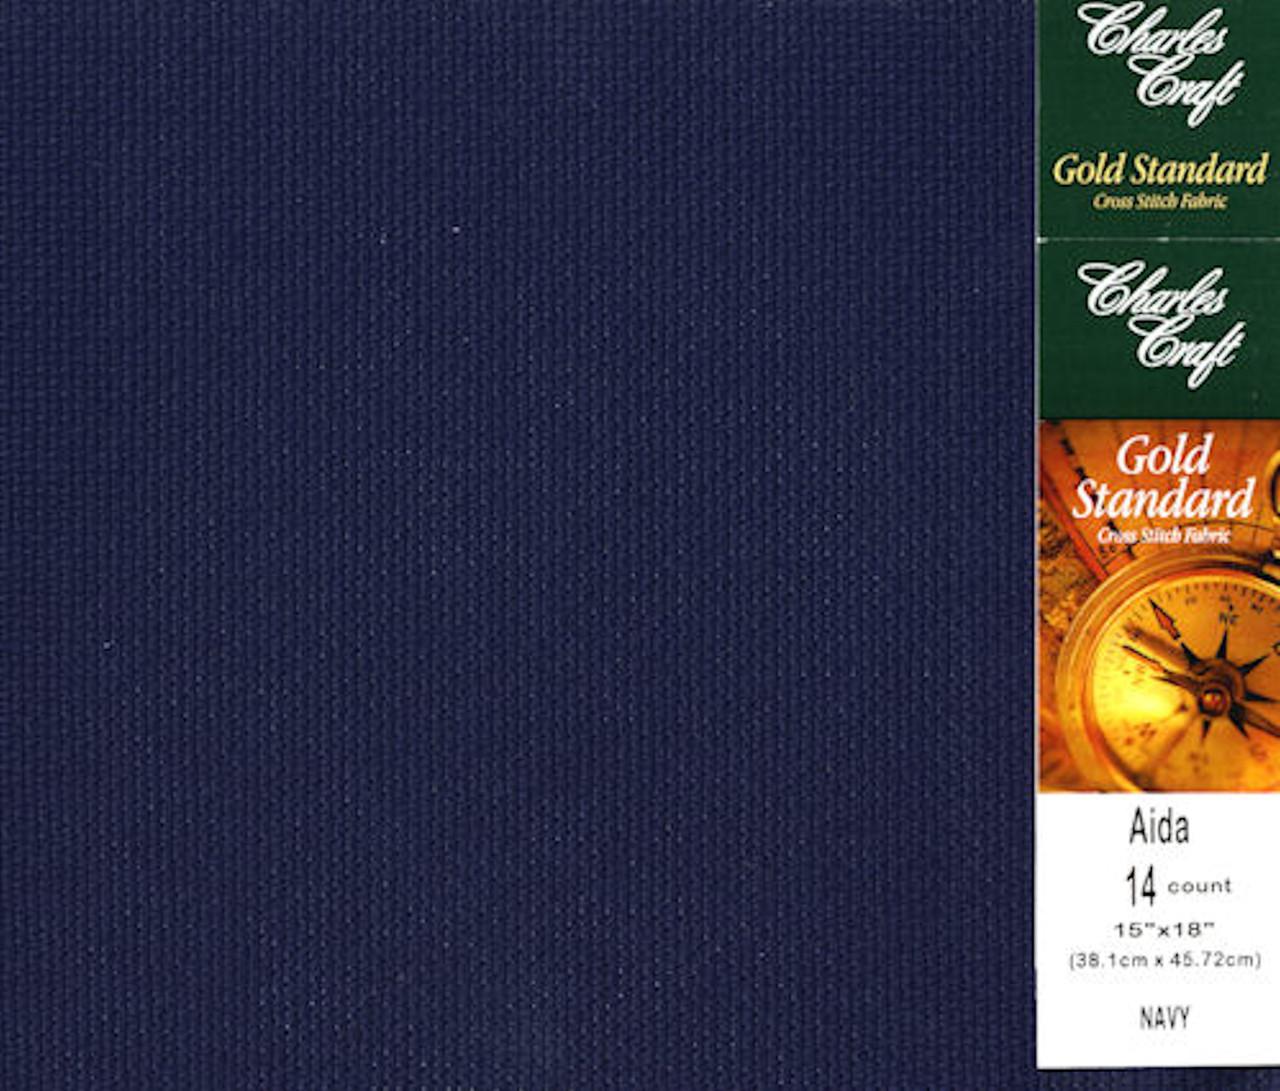 "Charles Craft - 14 Count Navy Aida Fabric 15"" x 18"""